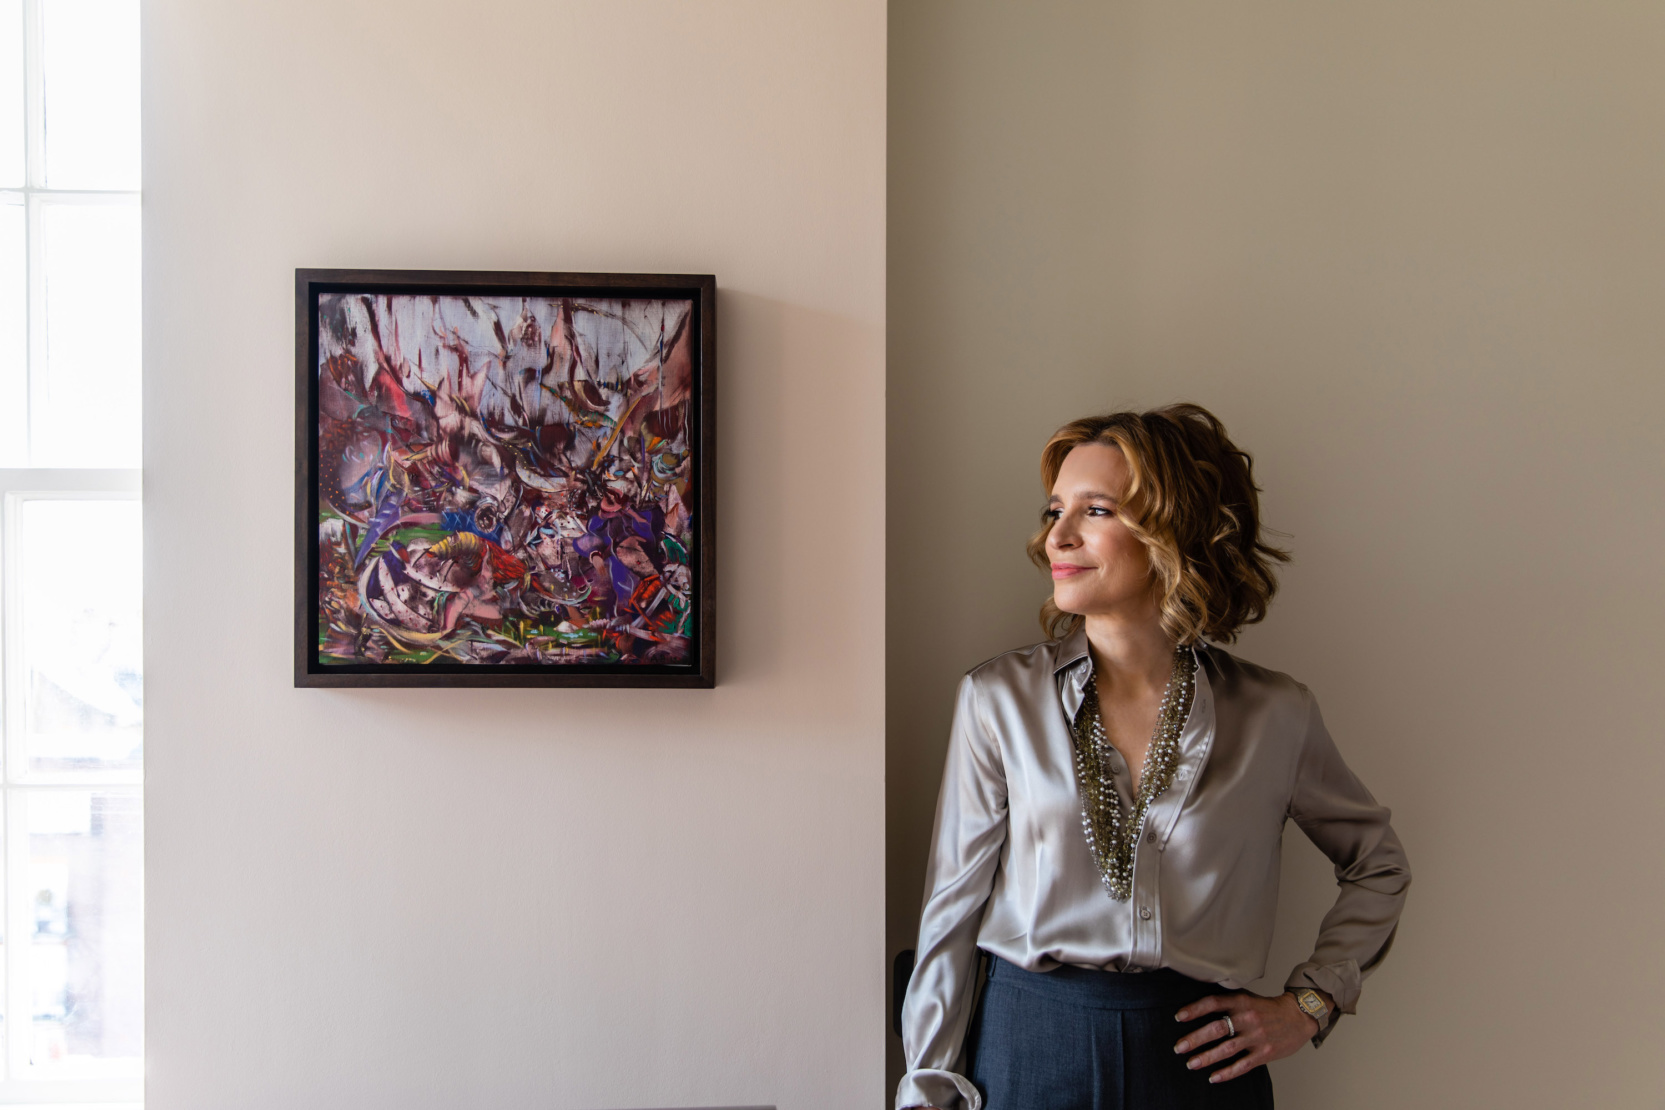 Wendy Goldsmith with Ali Banisadr, The Devil, 2012.